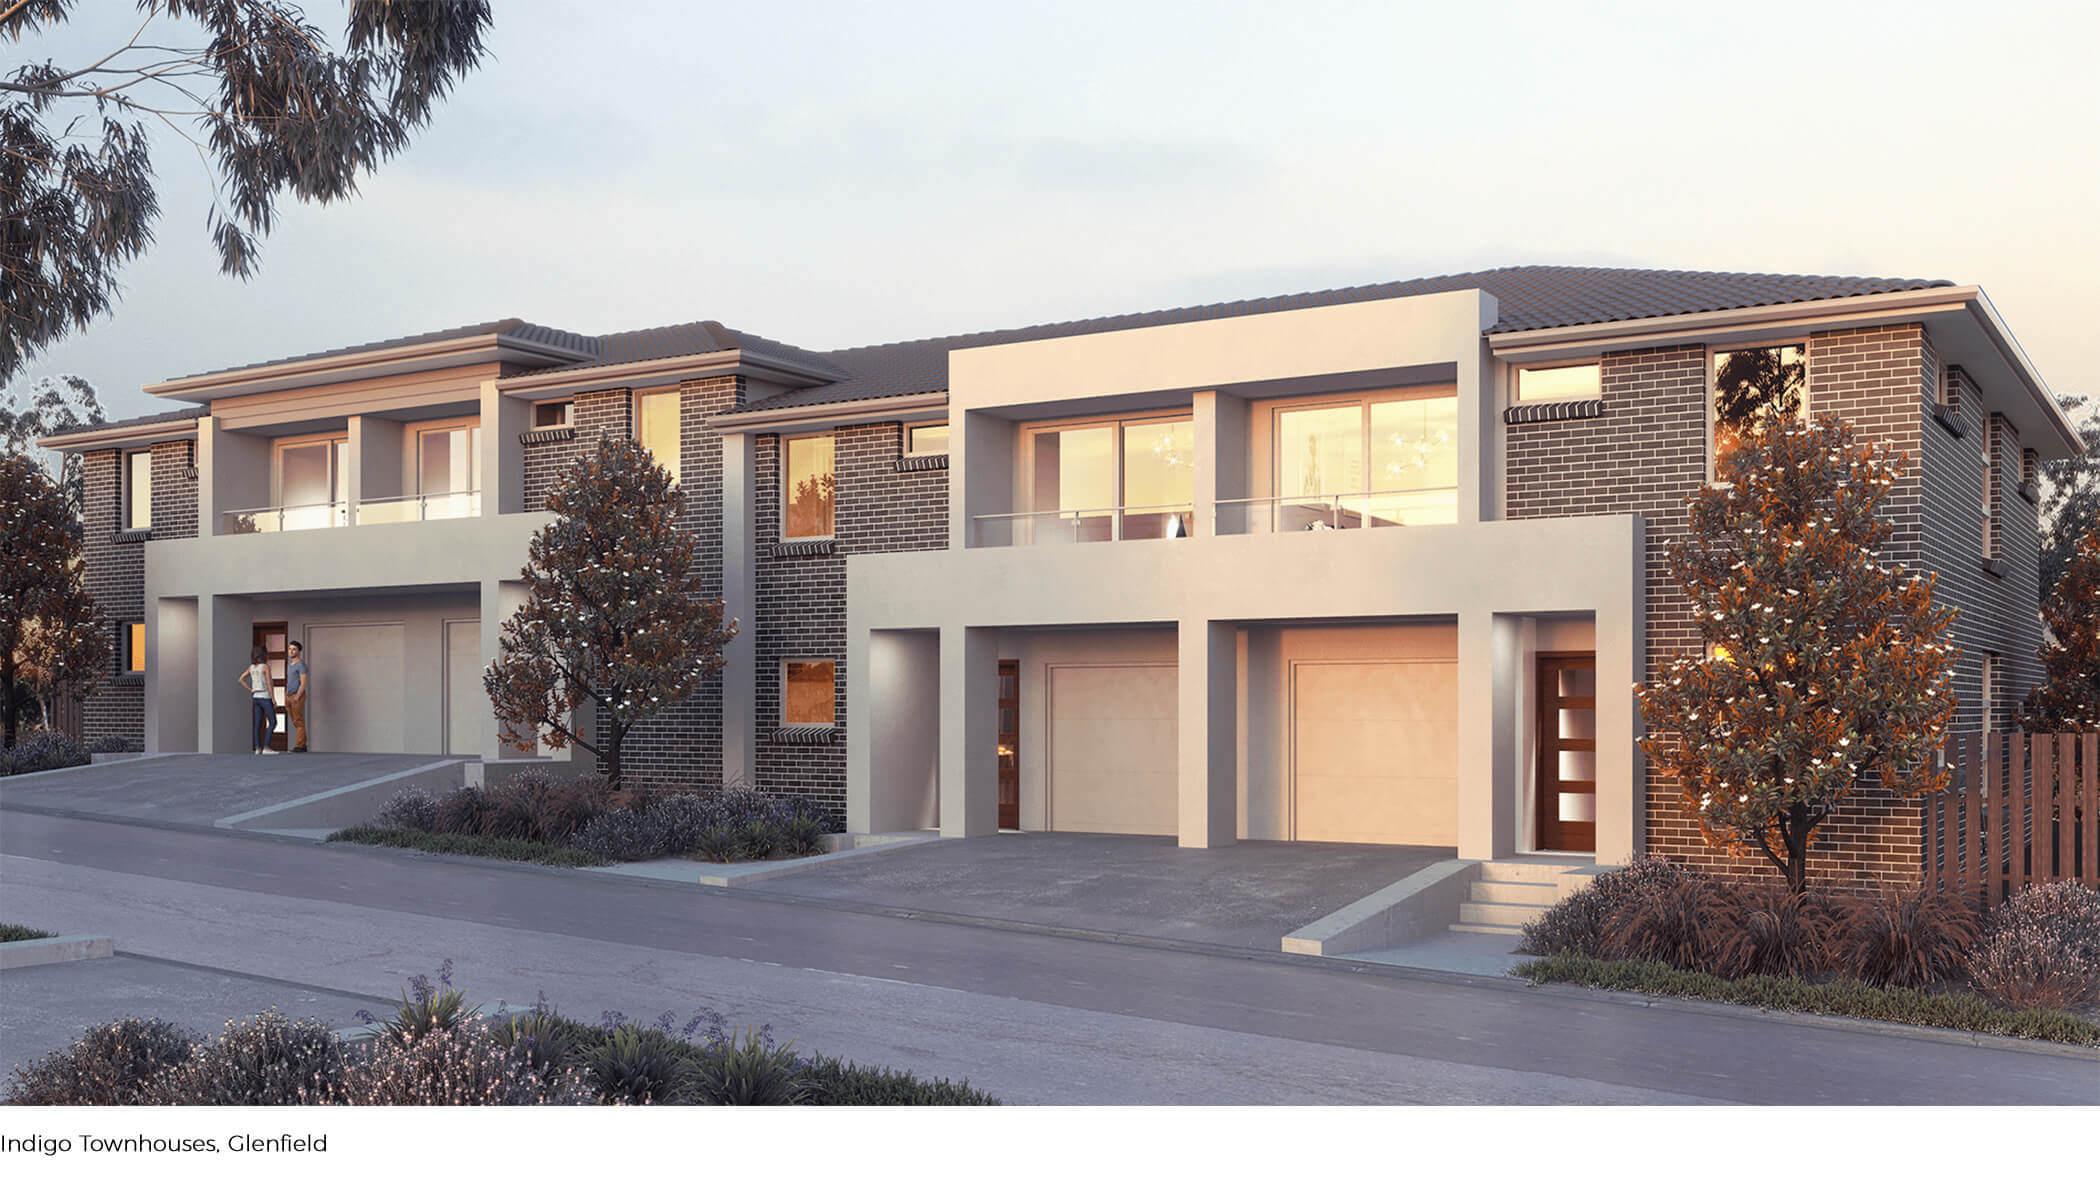 home-quest-hamlet-rosemeadow-property-developer-3-caption-3